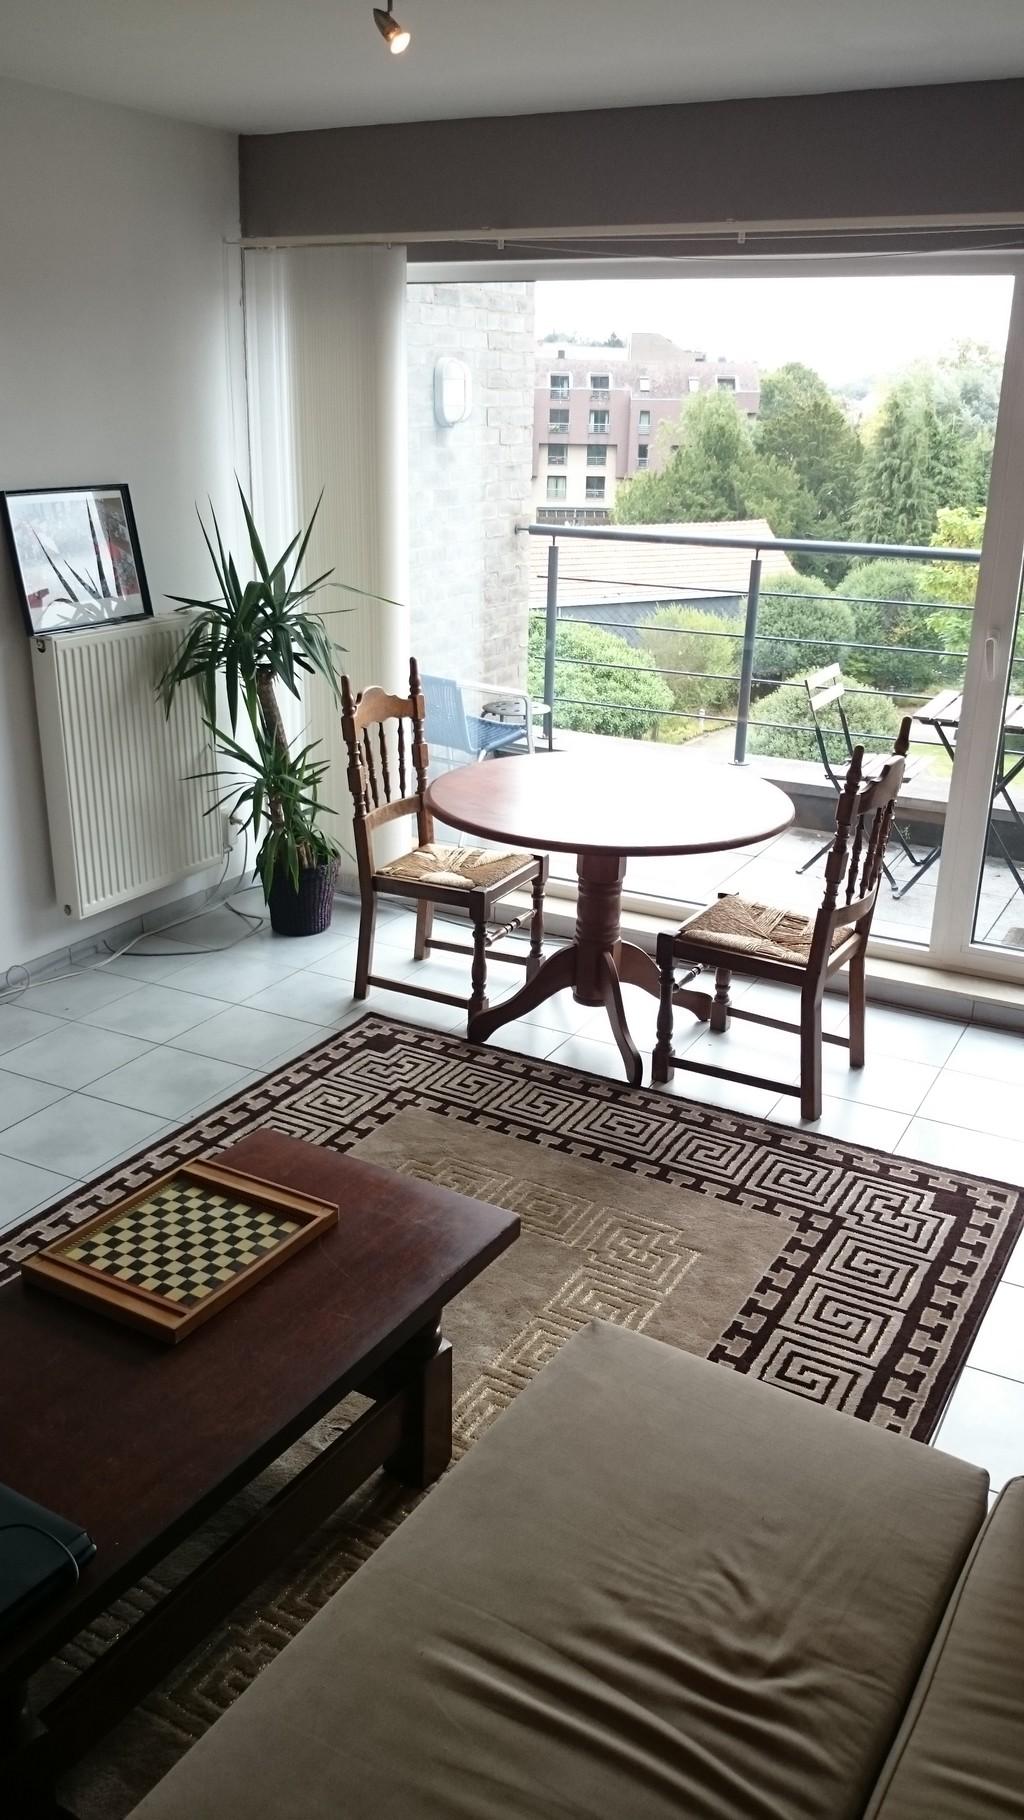 im-looking-roommate-share-cozy-modern-duplex-apartment-e260119da8c4430ed86c0f846debf157